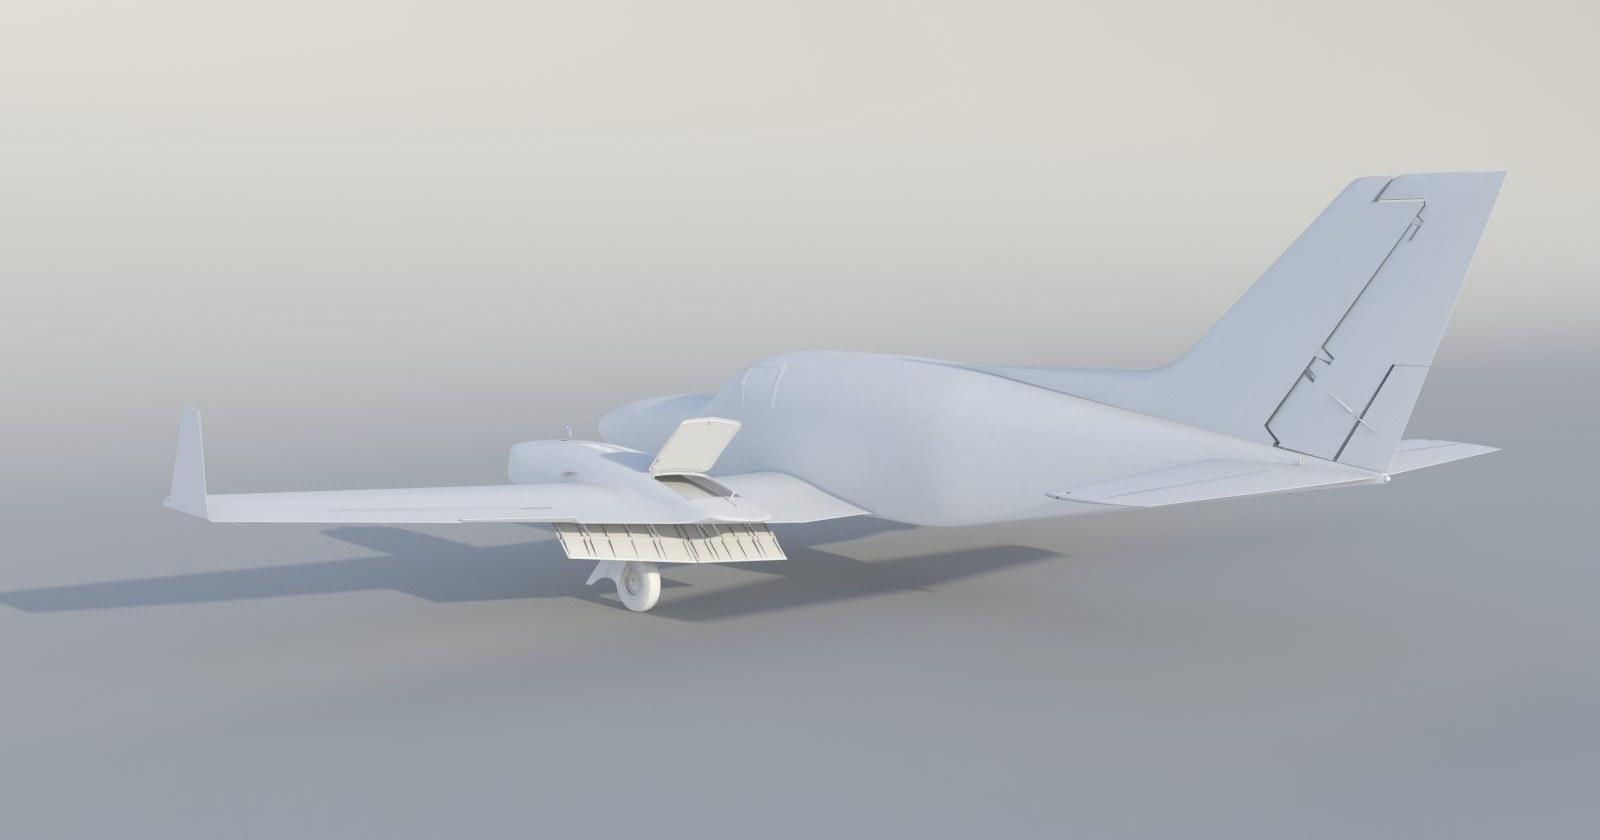 Flysimware Cessna 414 announced